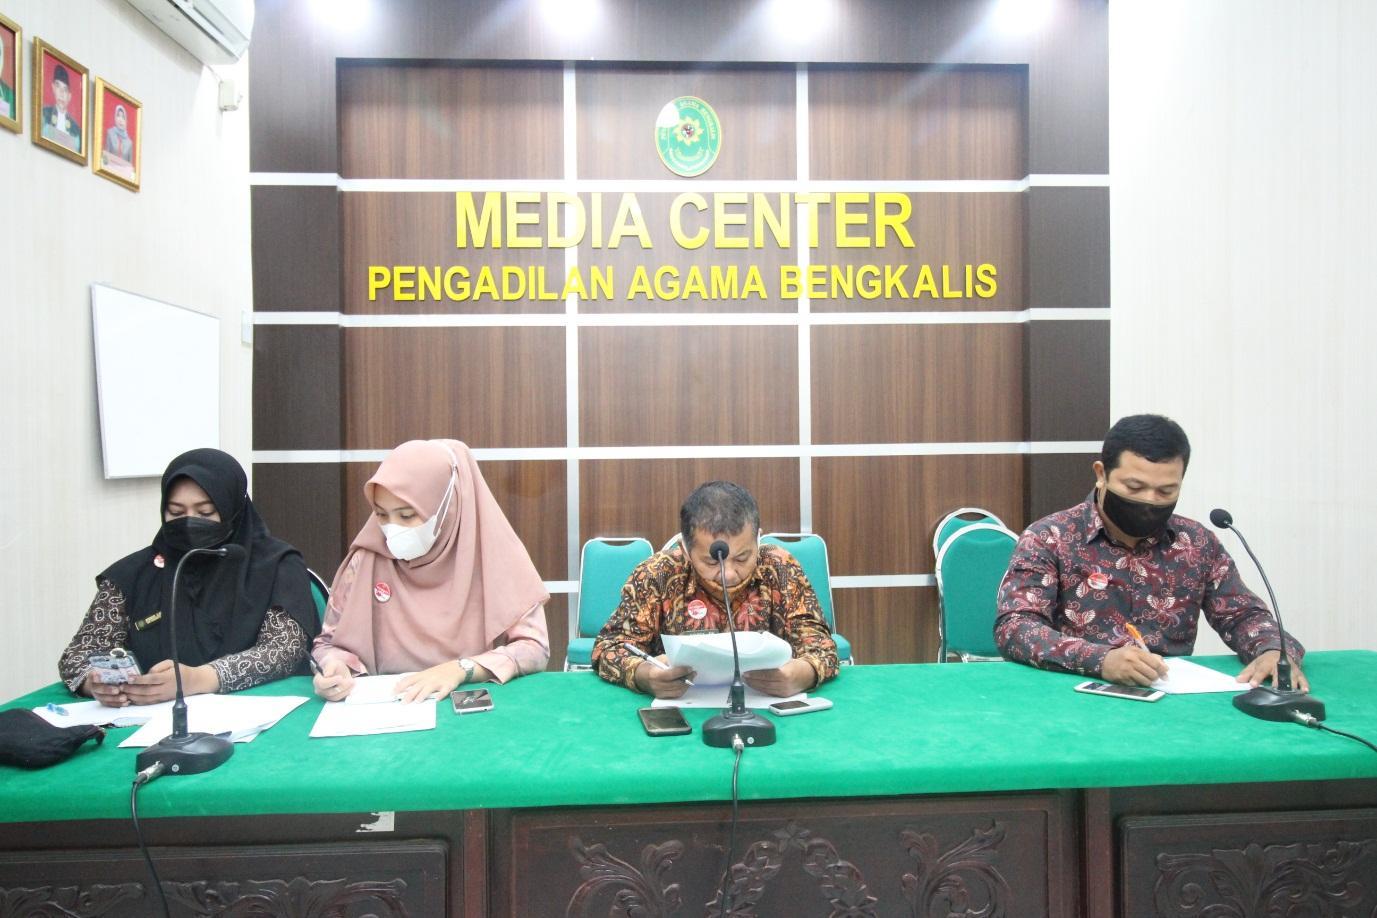 Pengadilan Agama Bengkalis Ikuti Bimtek Penyusunan RKA-K/L Pagu Indikatif DIPA 01 TA 2022  | (14/6)